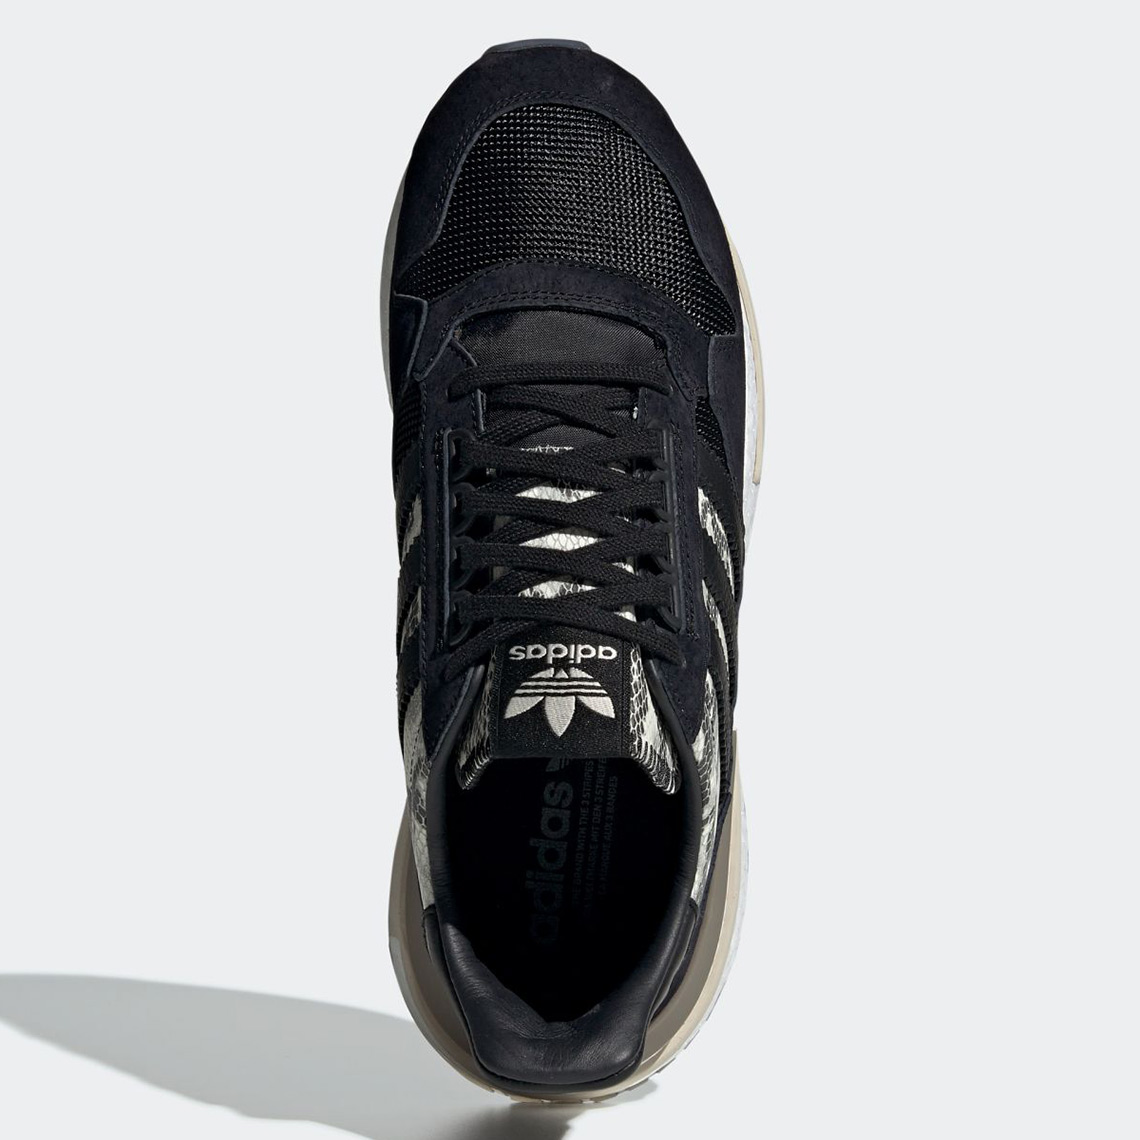 adidas zx 500 rm bd7924